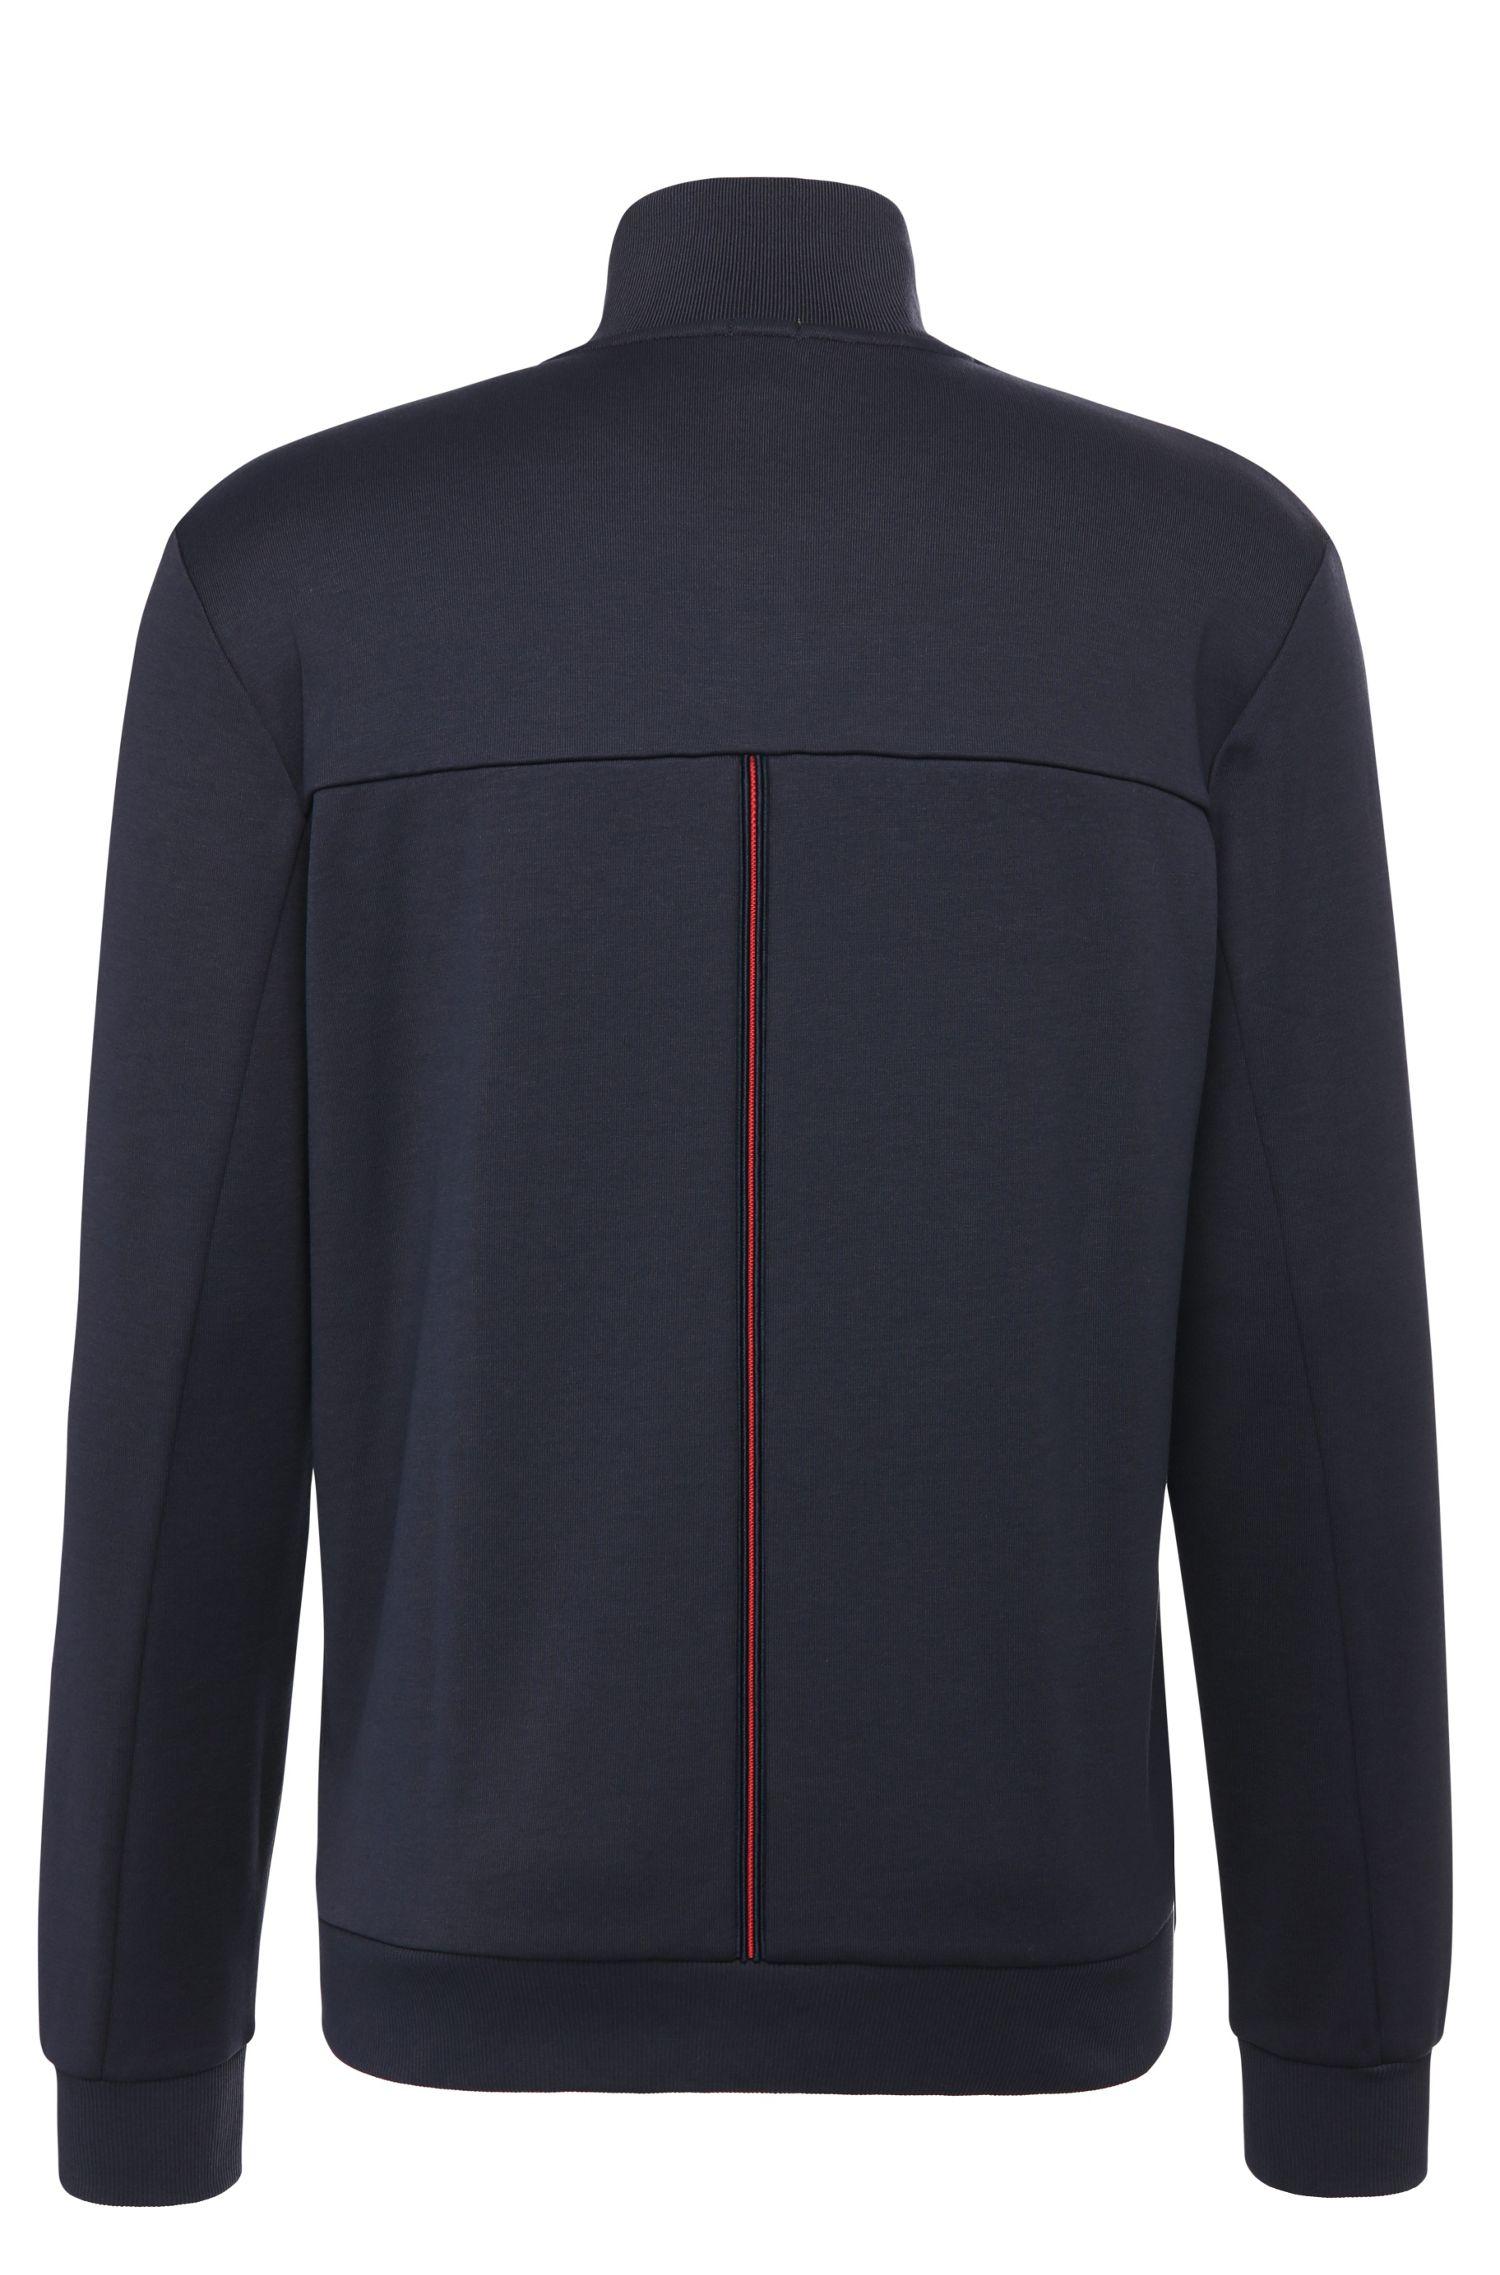 Regular-Fit Sweatshirt-Jacke aus Baumwoll-Mix: ´Skaz`